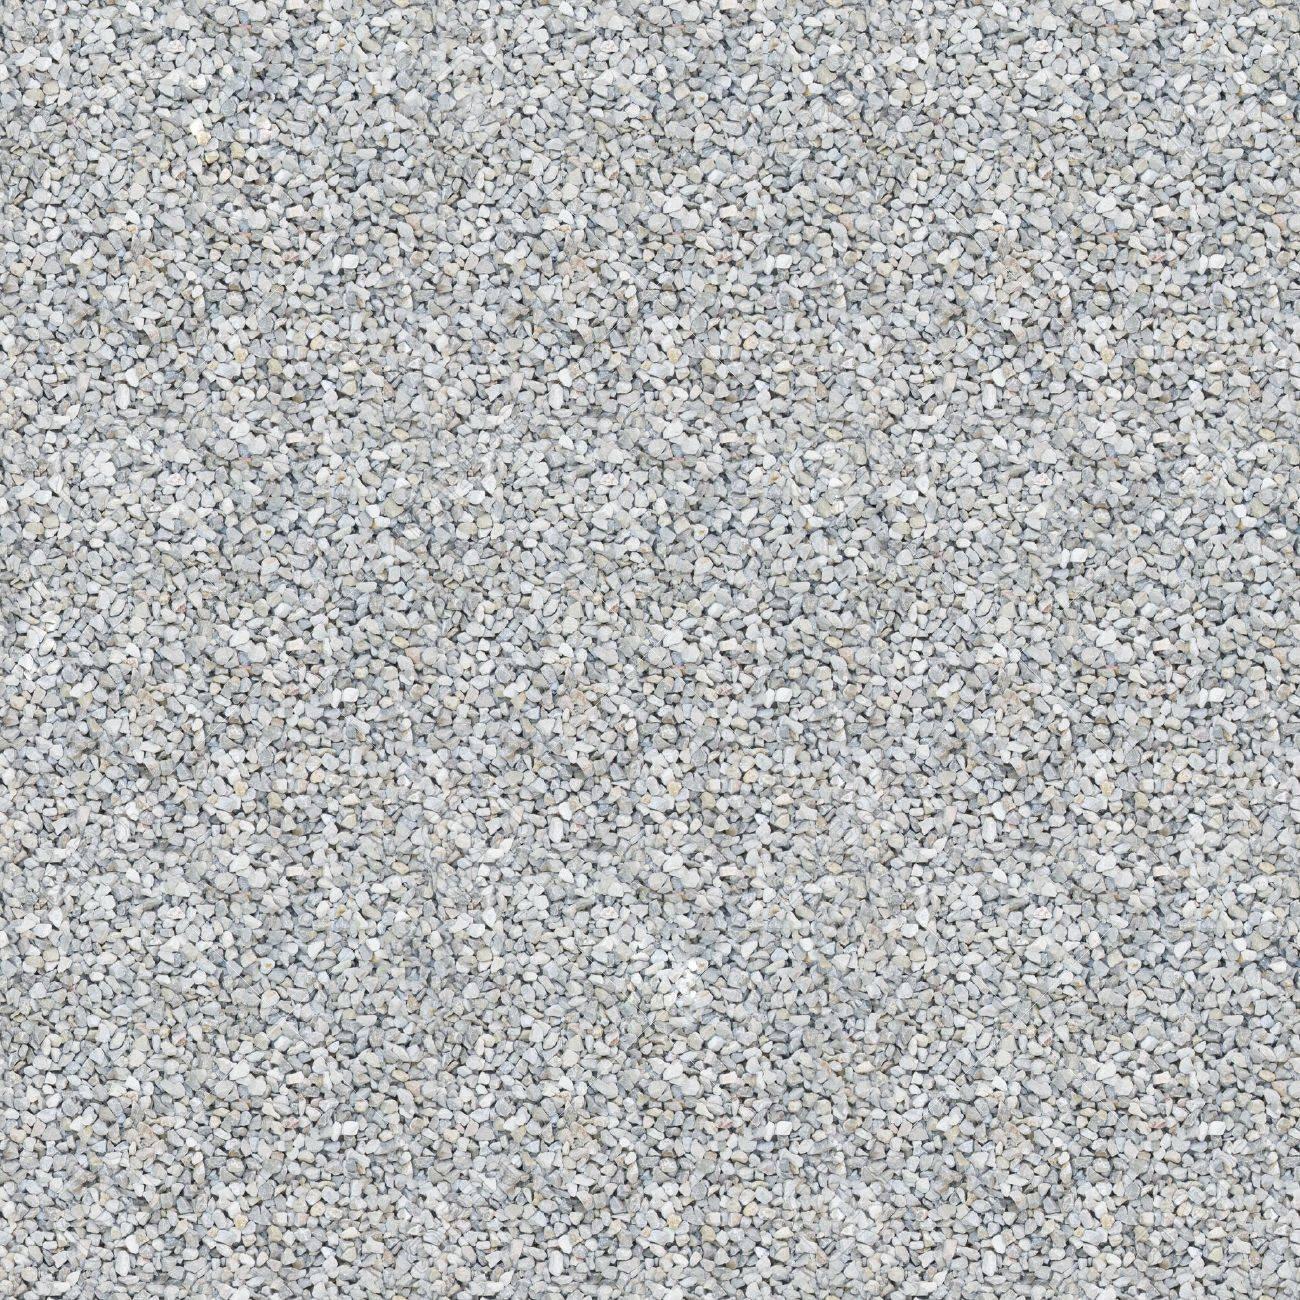 Gravel tiling texture background - 10890031